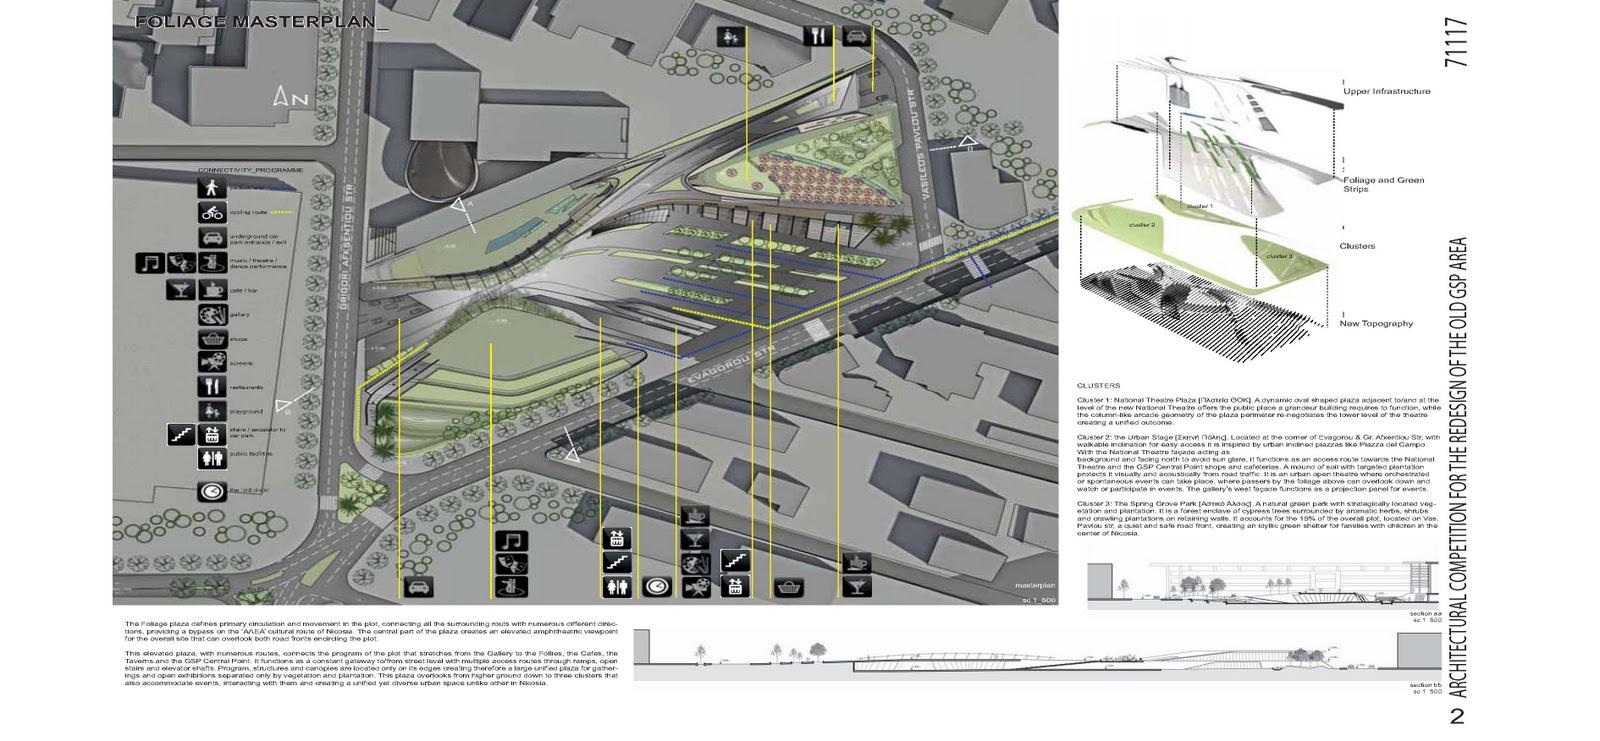 Io carydi for Architectural design services near me